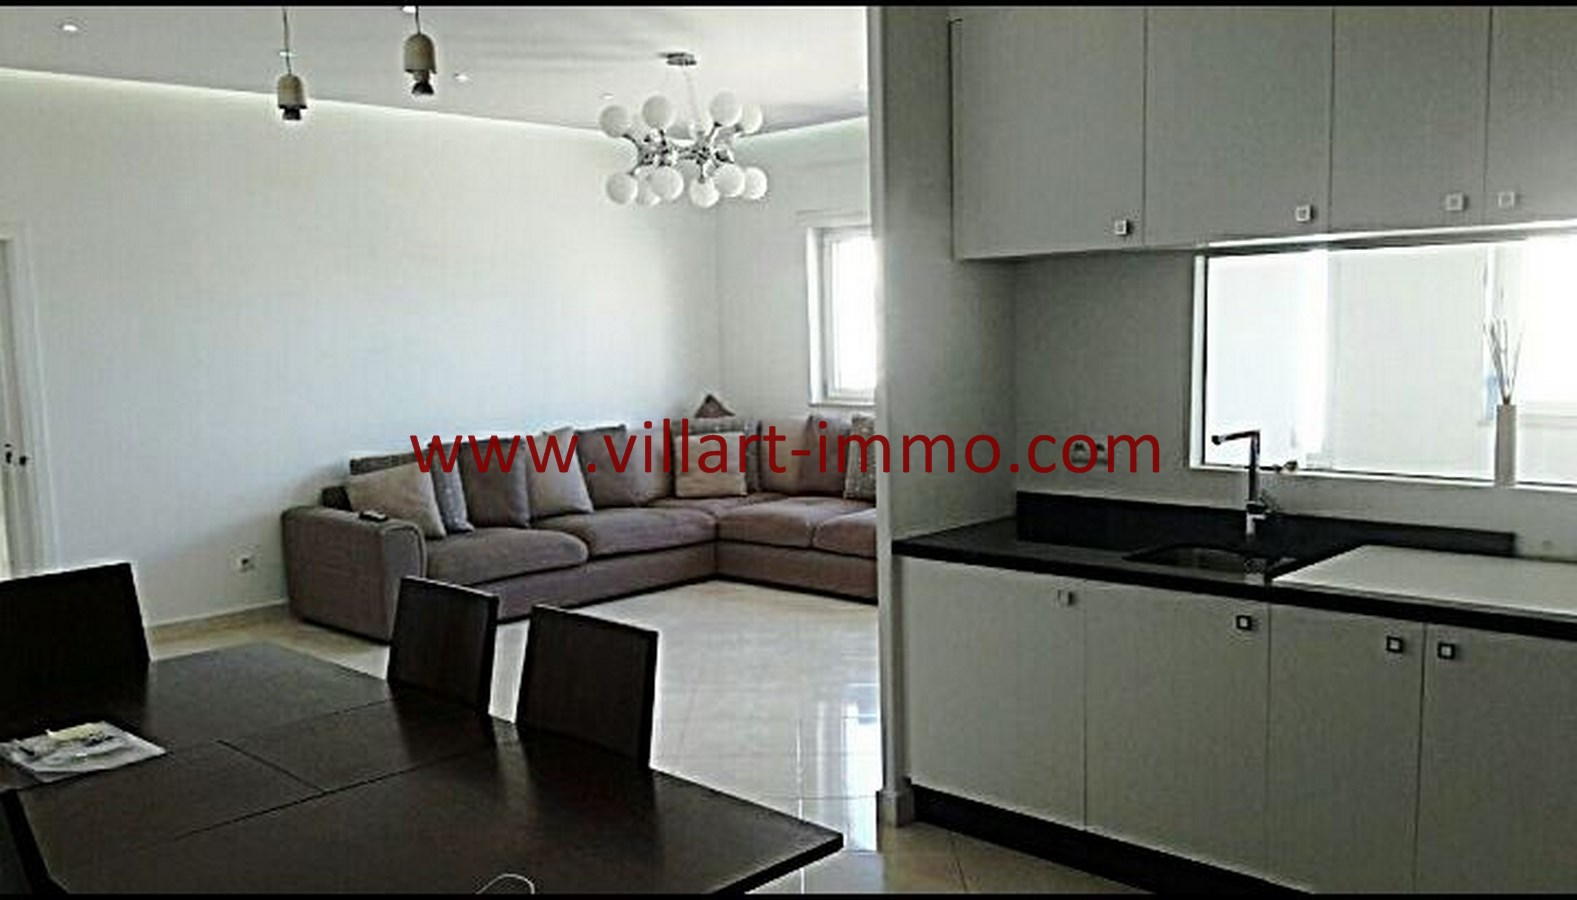 6-Vente-Appartement-Tanger-Malabata-Cuisine 1-VA490-Villart Immo (Copier)